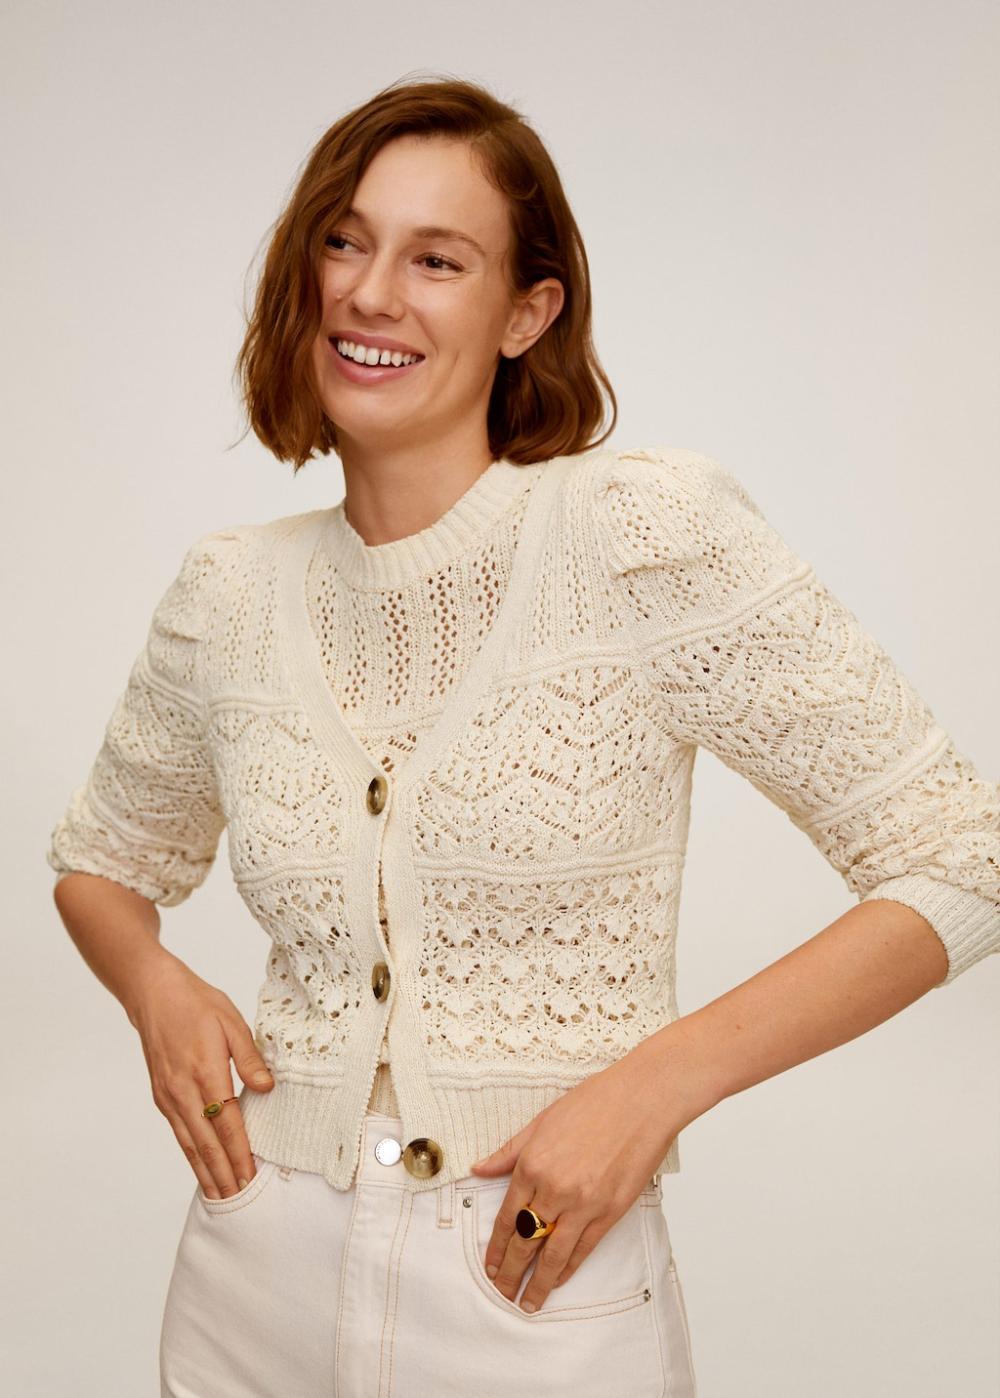 Cotton sweater Openwork Summer sweater ecru sweater